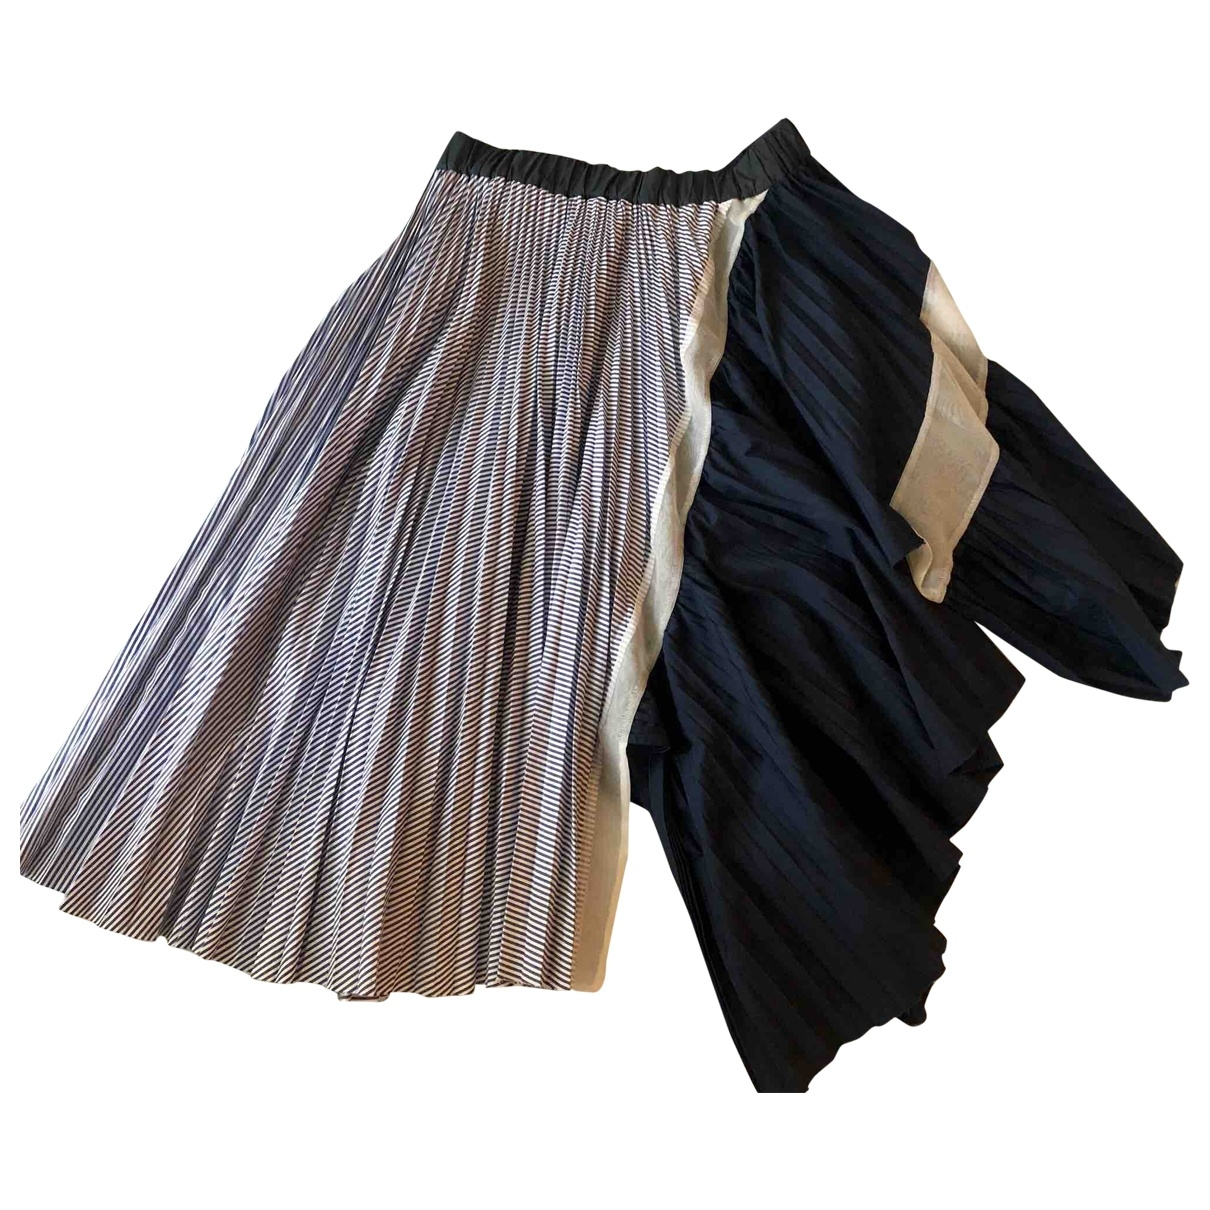 Sacai \N Blue Cotton skirt for Women 2 0-5